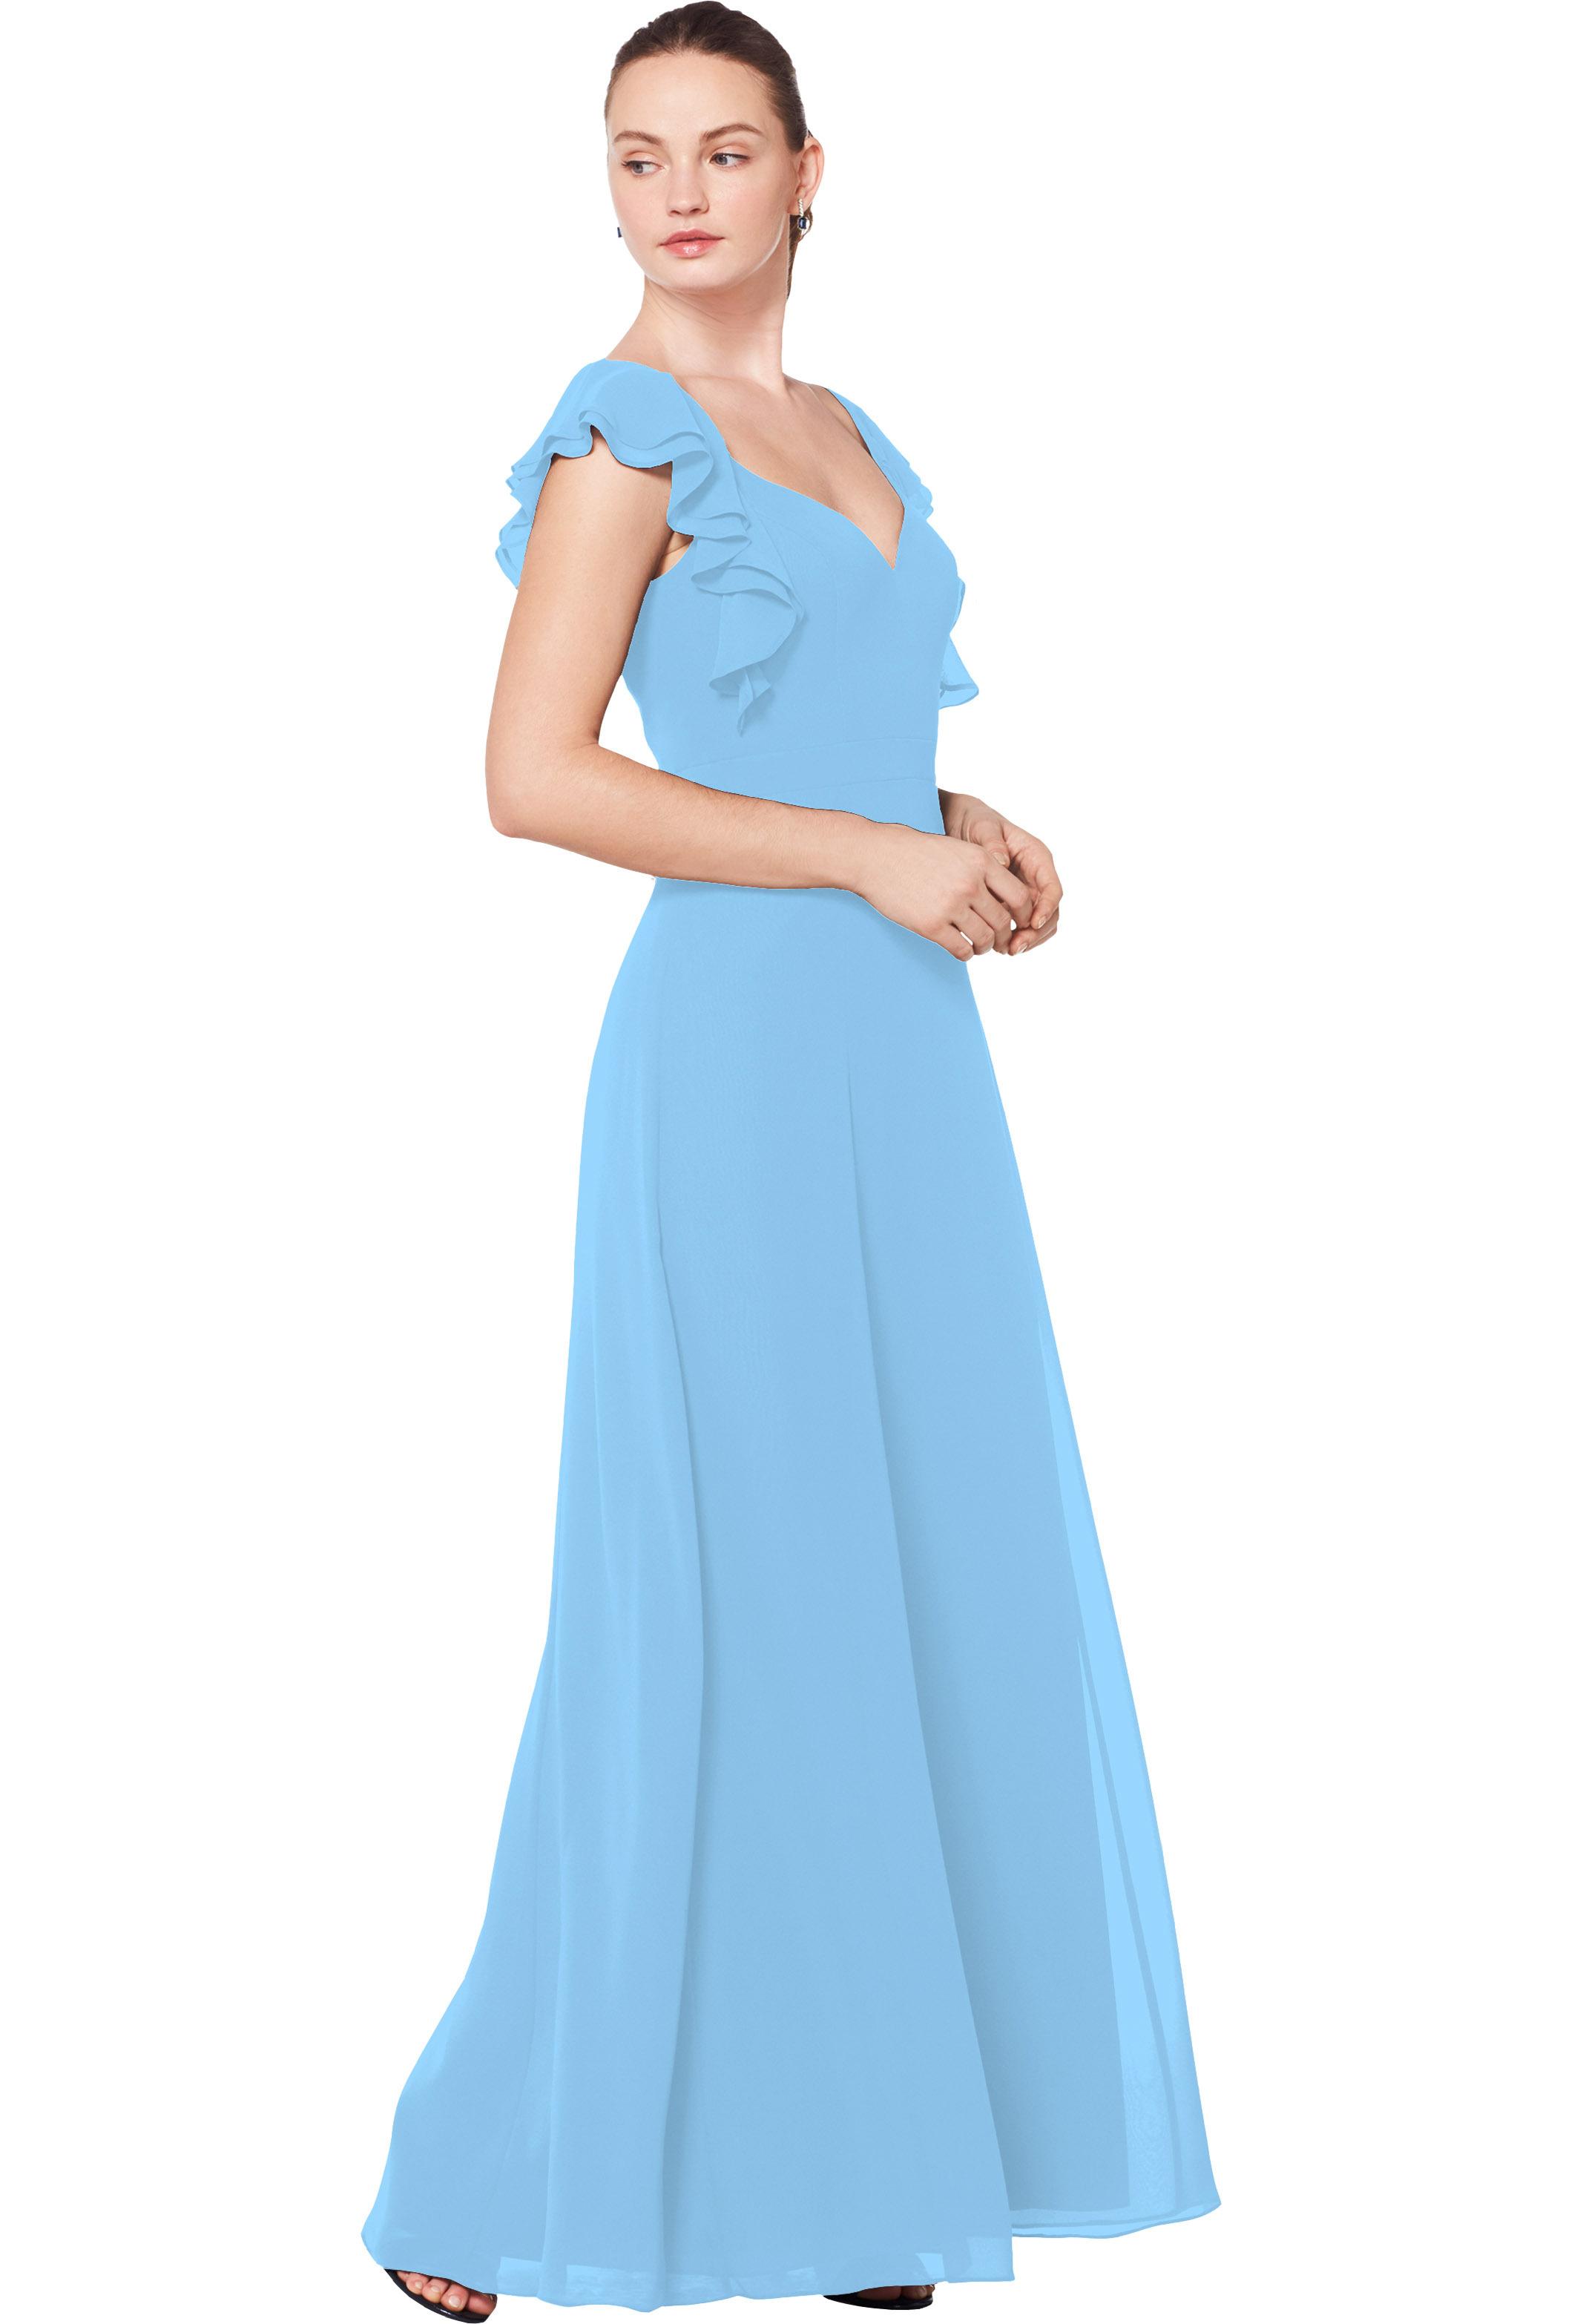 Bill Levkoff CAPRI Chiffon Sweetheart A-line gown, $210.00 Front